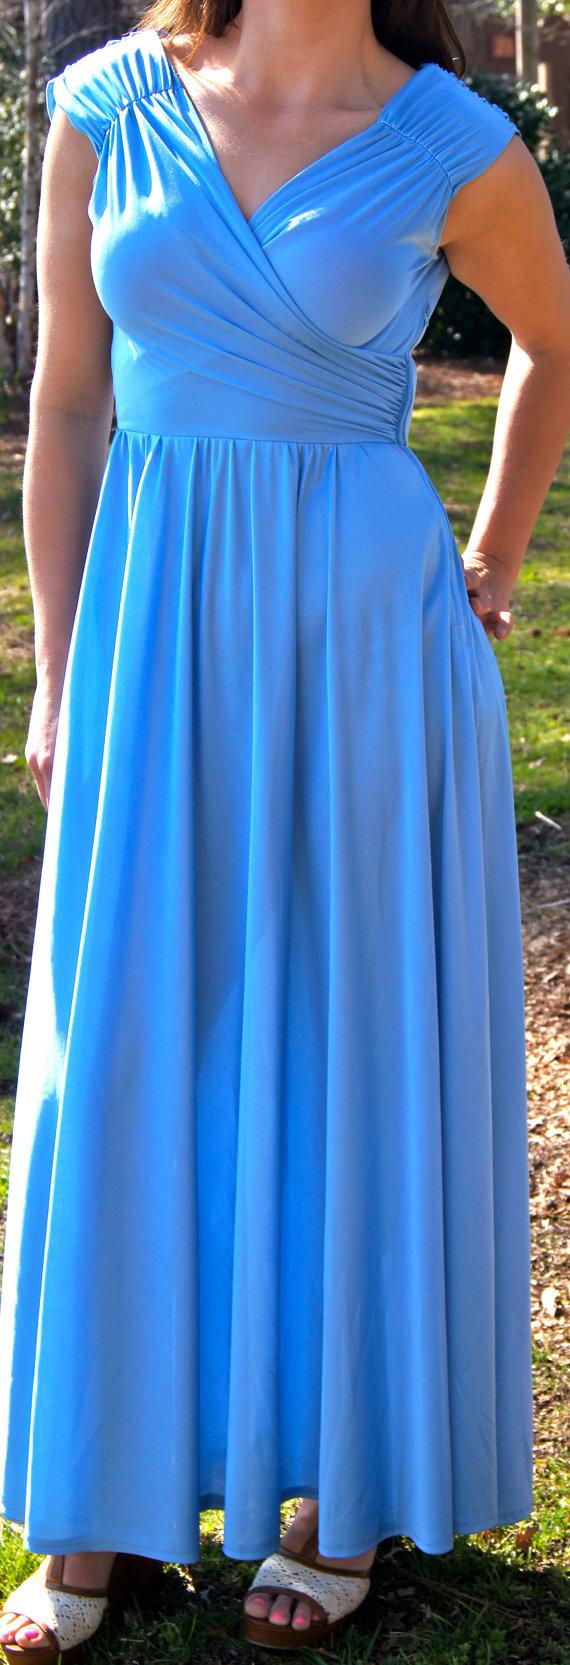 Greek Goddess Maxi Dress - Make Your Life Special